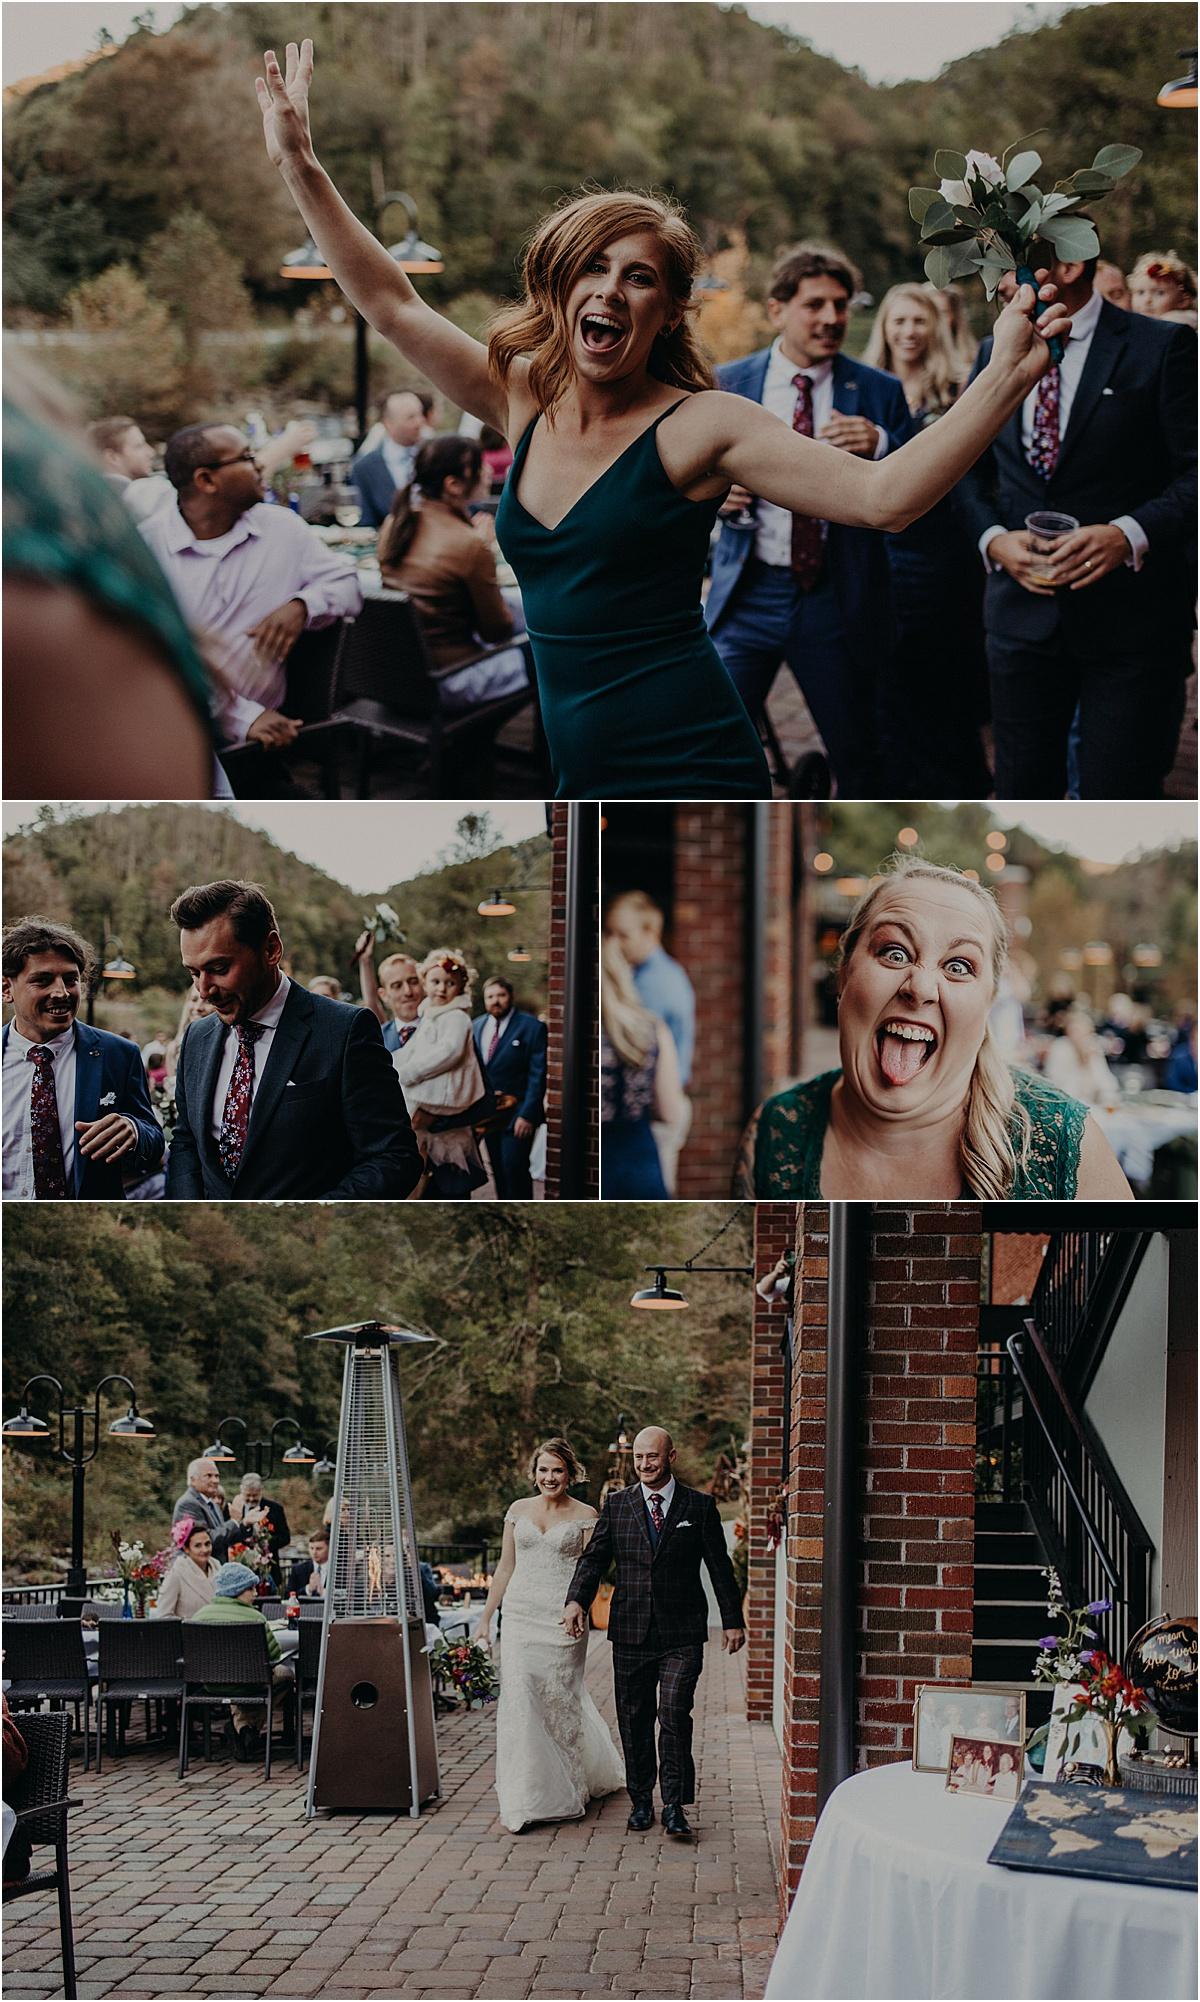 bridal party entering wedding reception with bride and groom